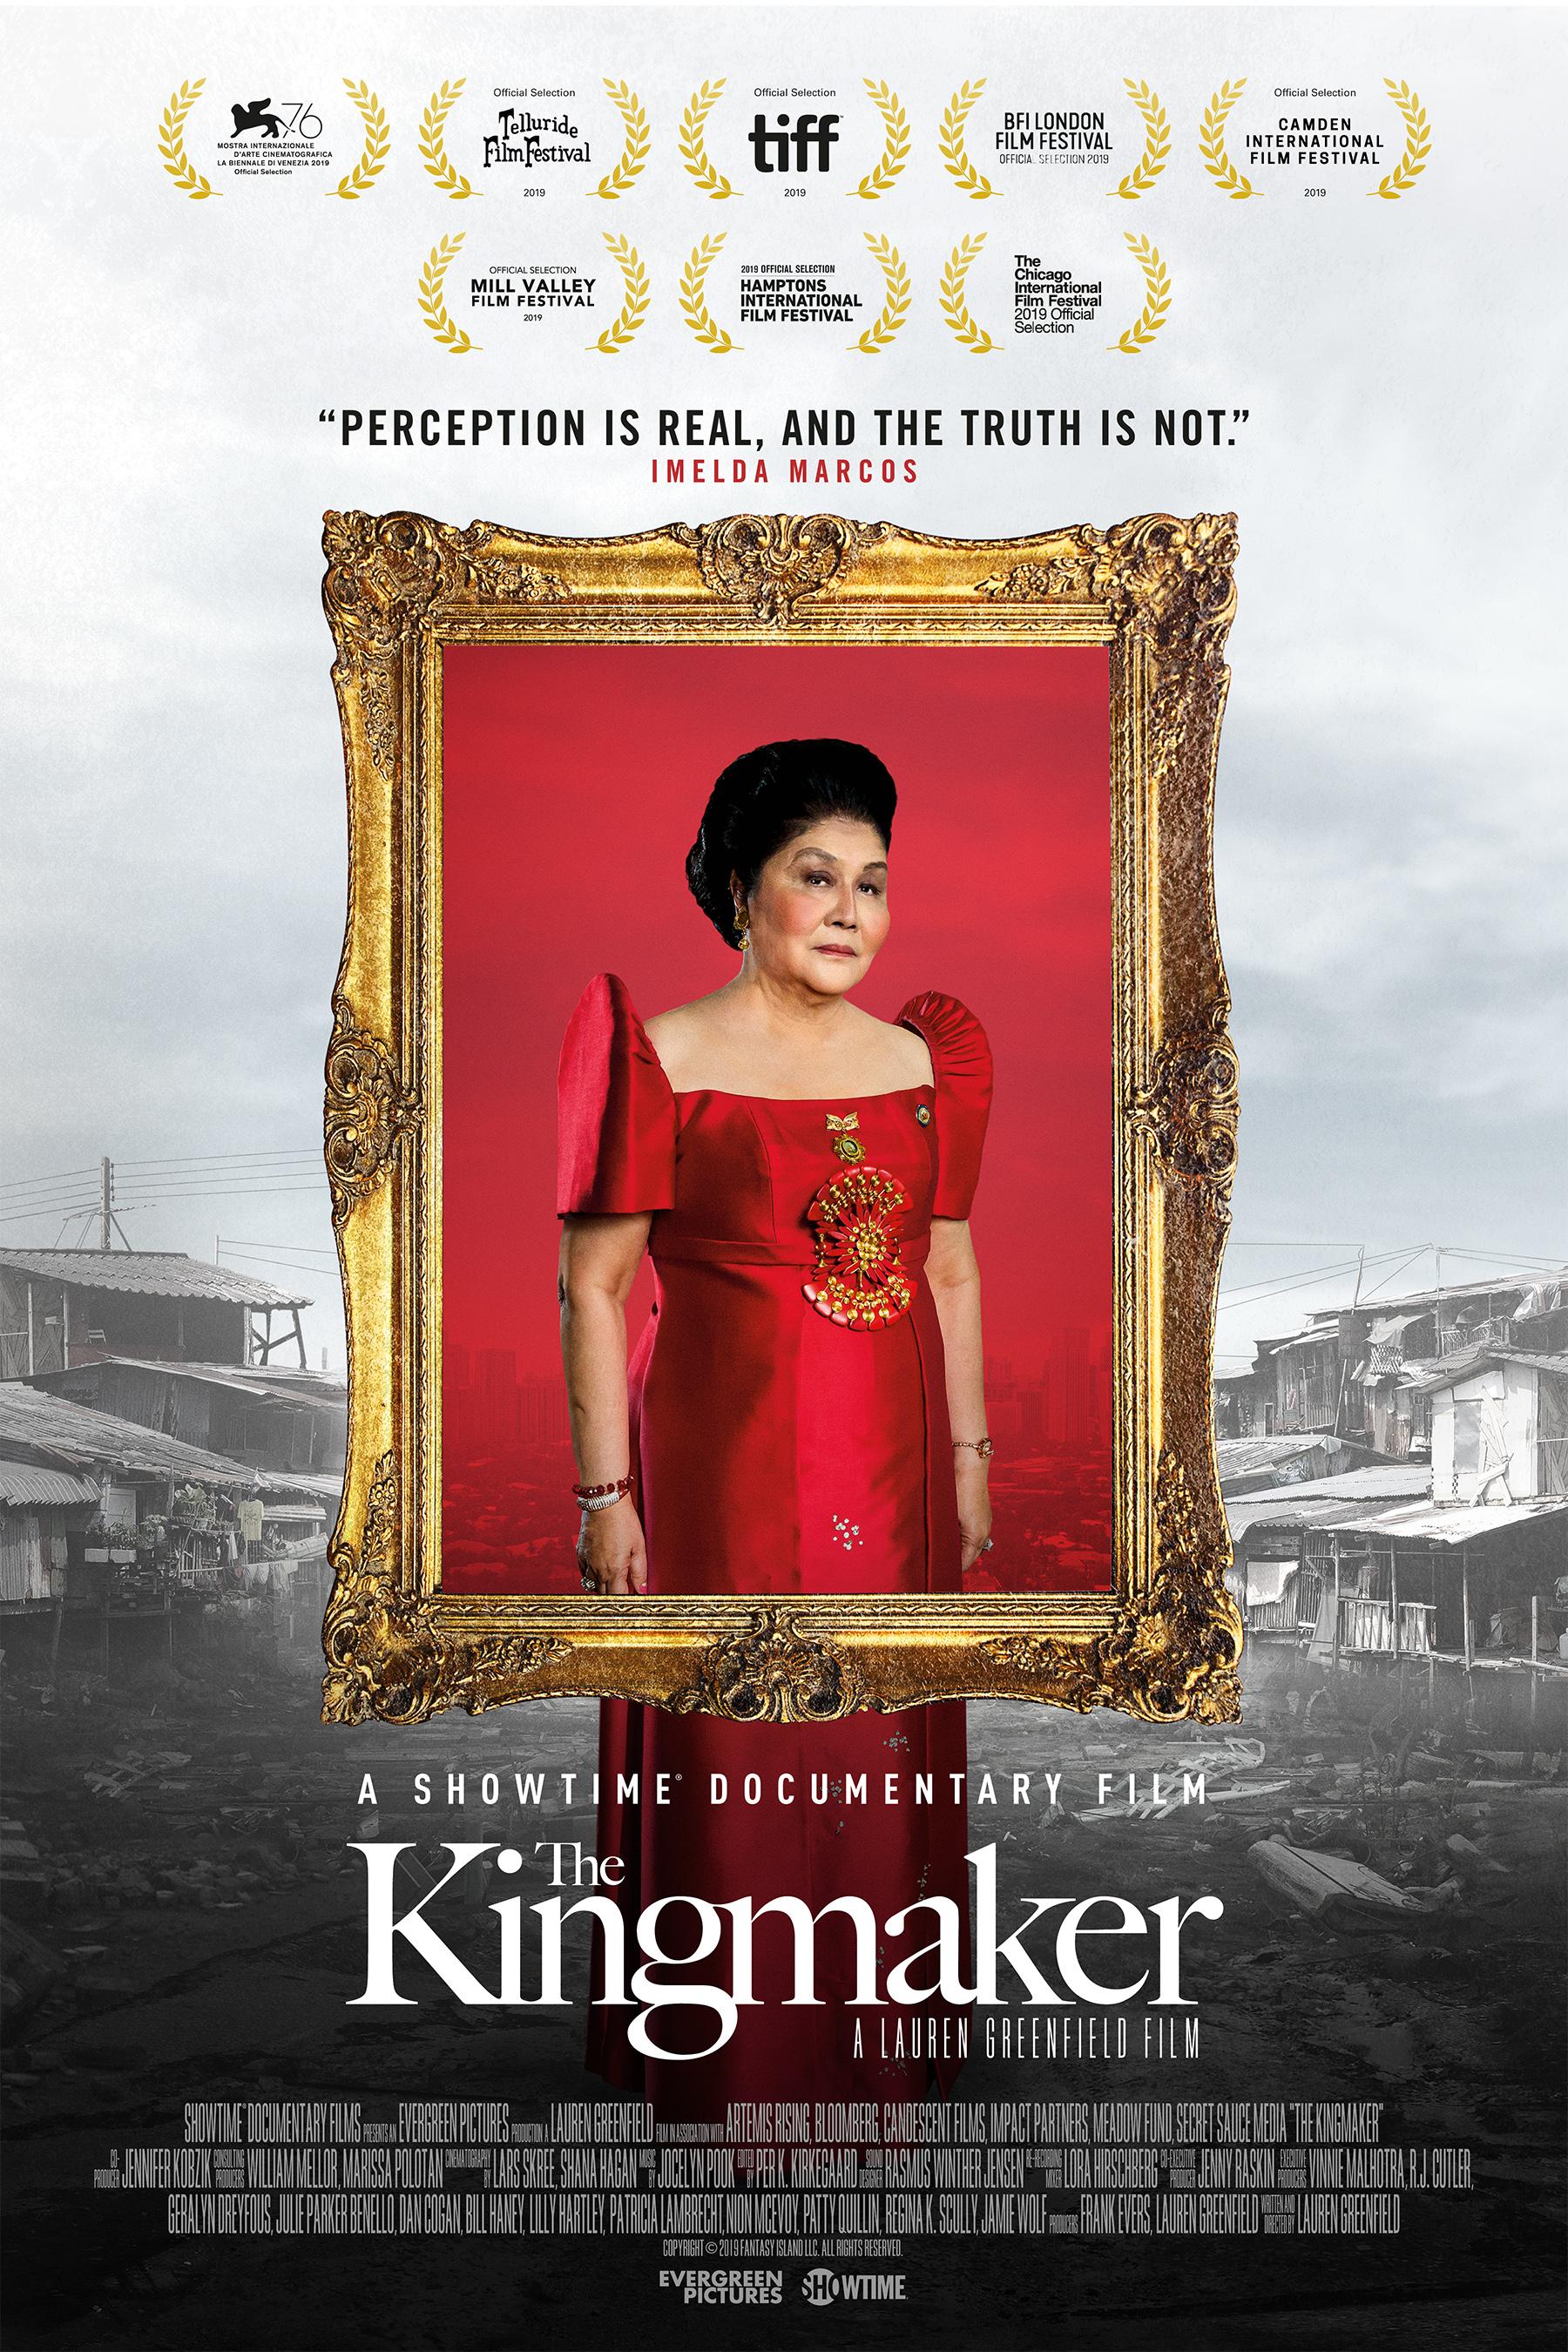 Poster for Showtime documentary 'The Kingmaker'